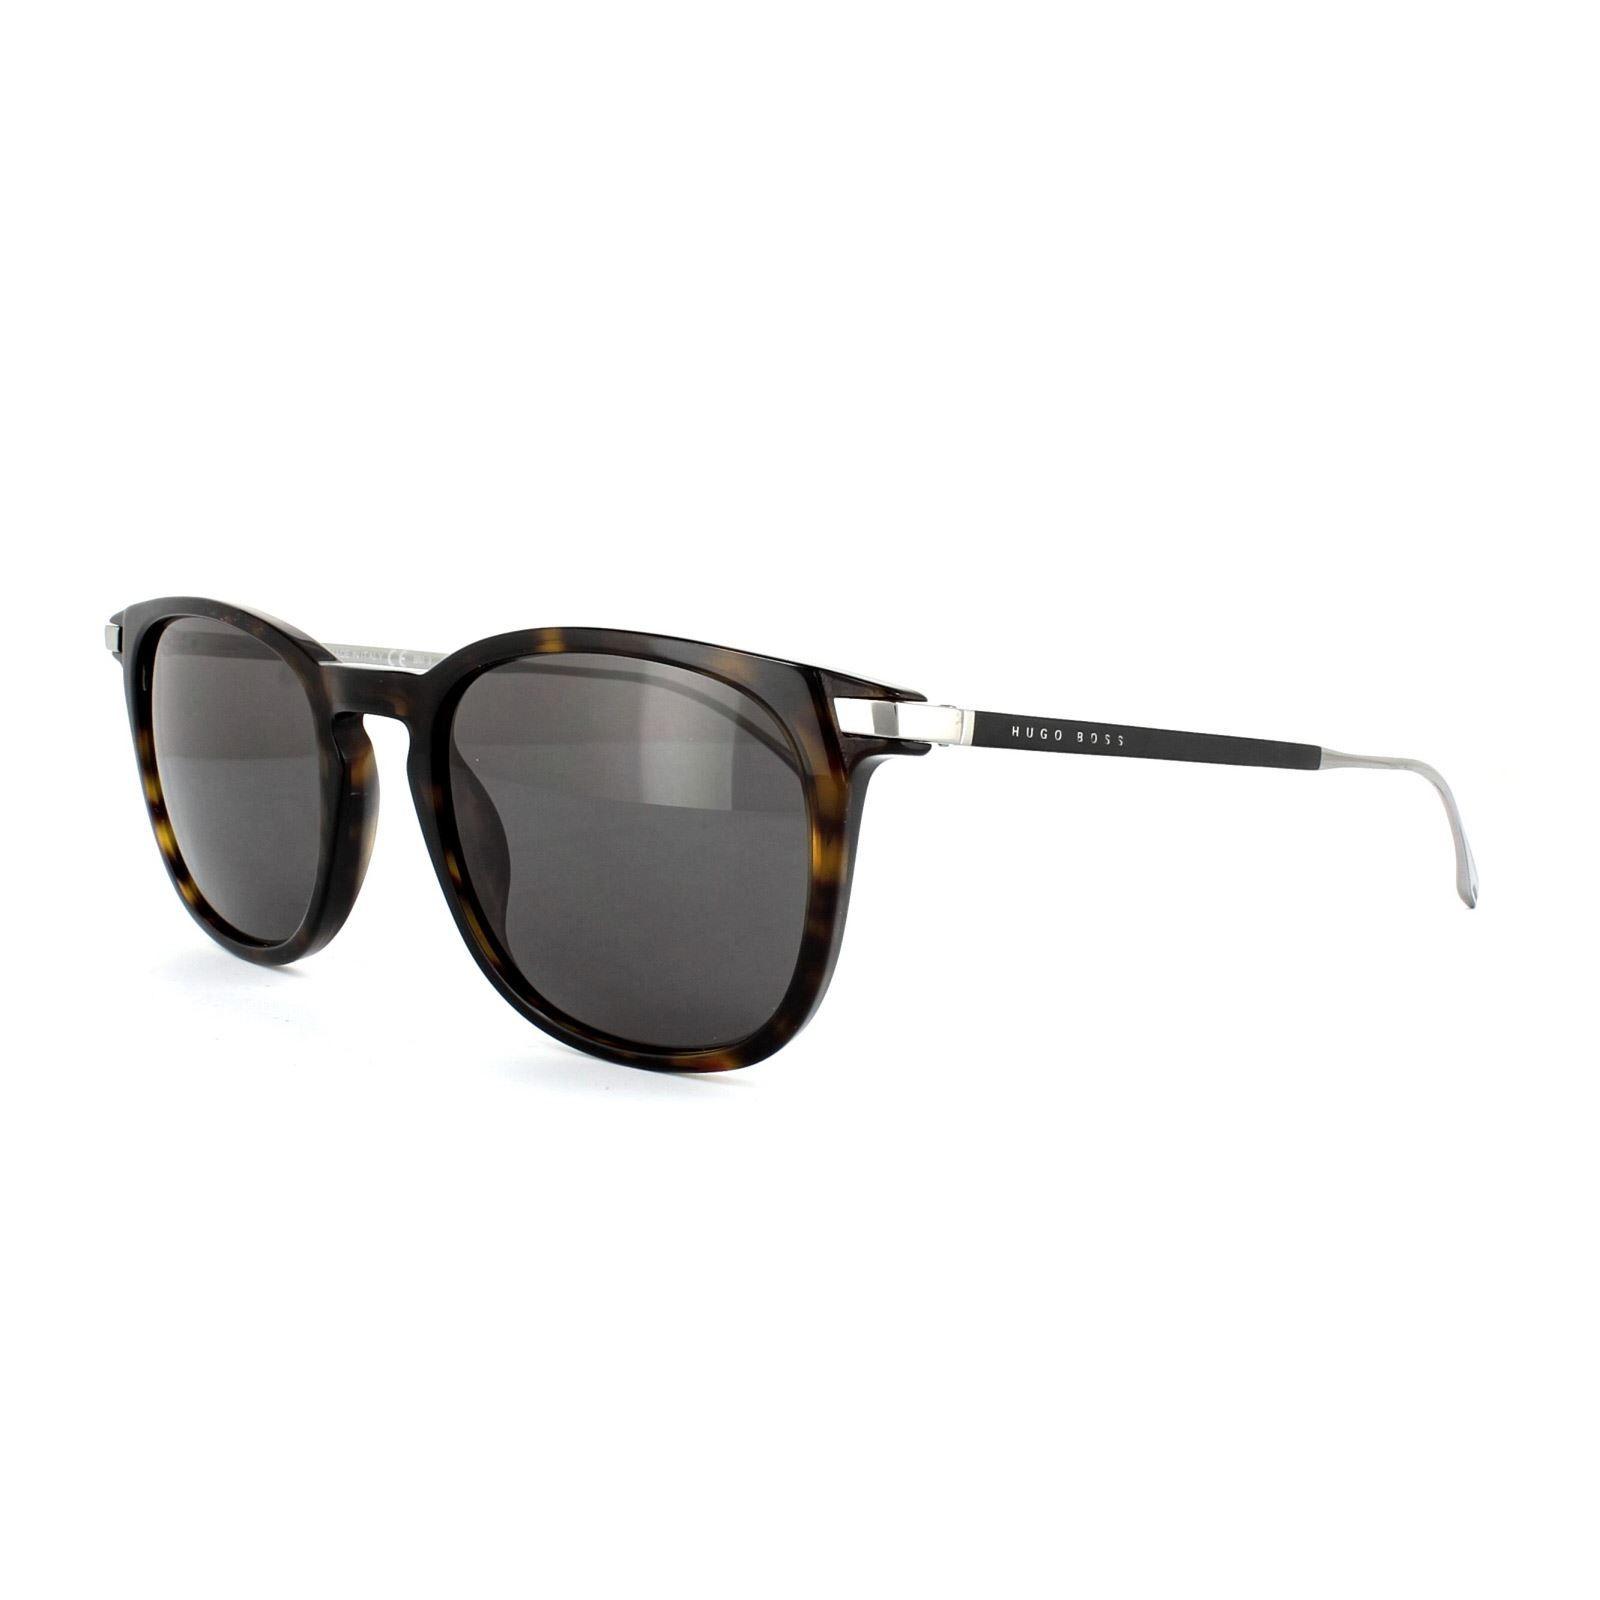 Hugo Boss Sunglasses 0783 0PC Y1 Dark Havana Matt Black Grey